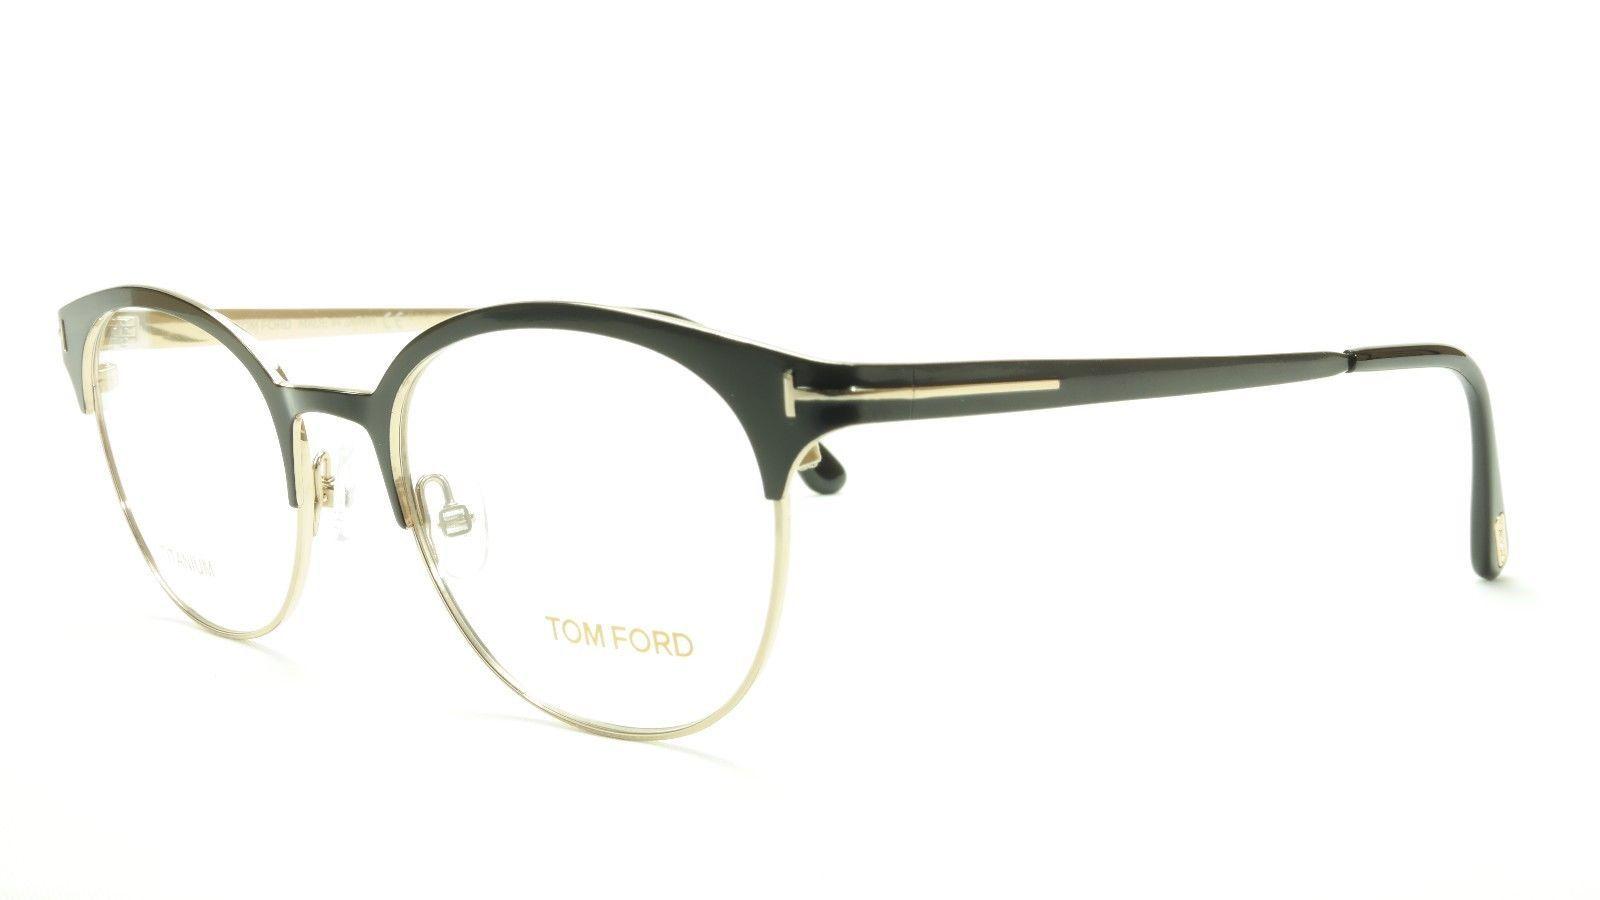 Tom Ford Eyeglasses Frame TF5382 005 Titanium Black Gold Made In Japan 50-19-145